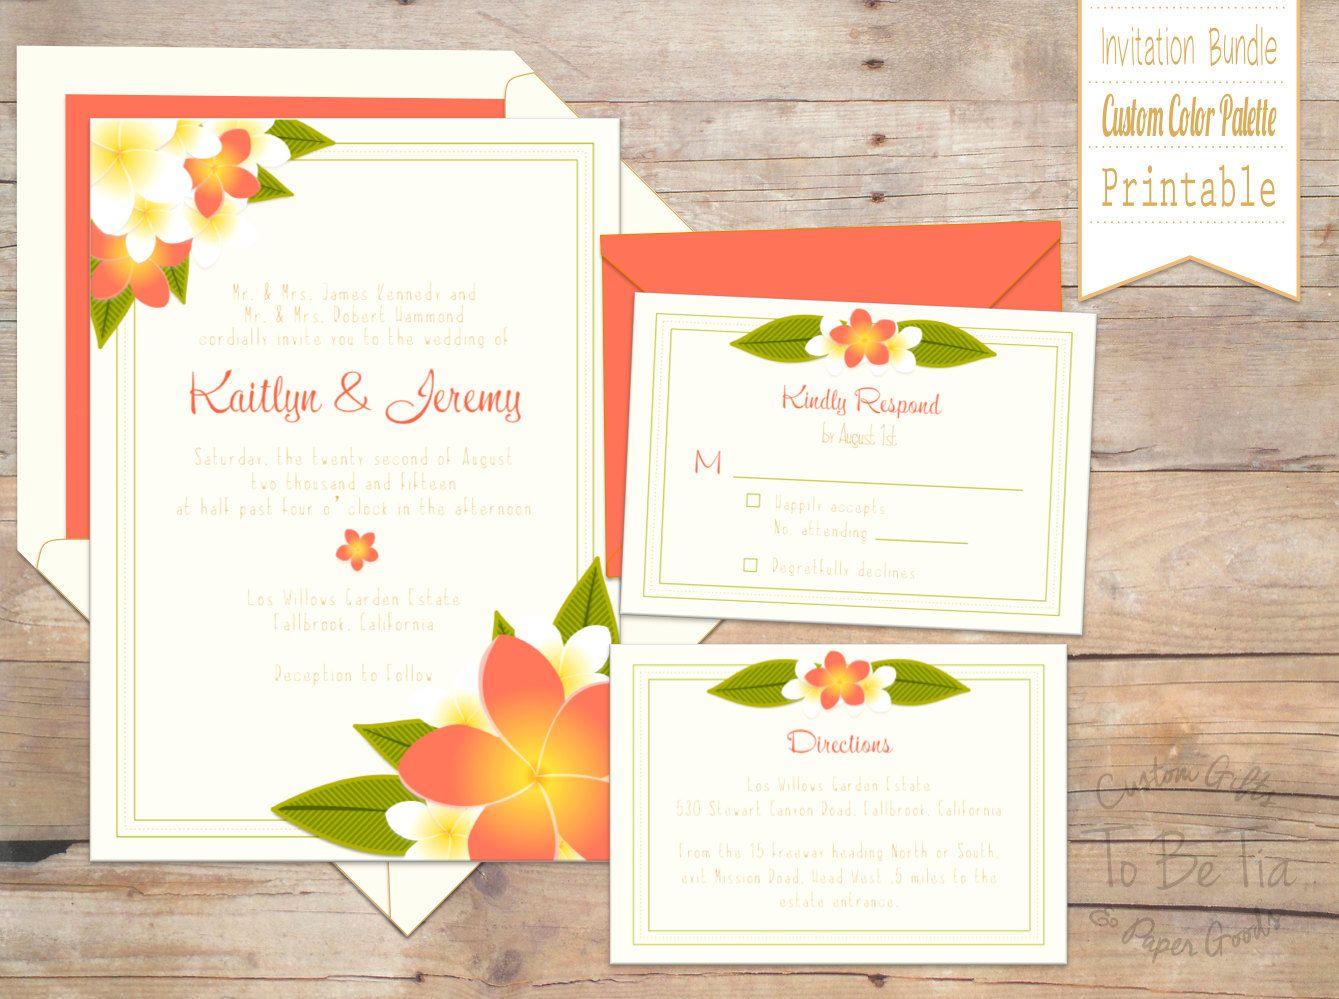 Custom-made, Printable Plumeria / Tropical Wedding Invitation Suite ...